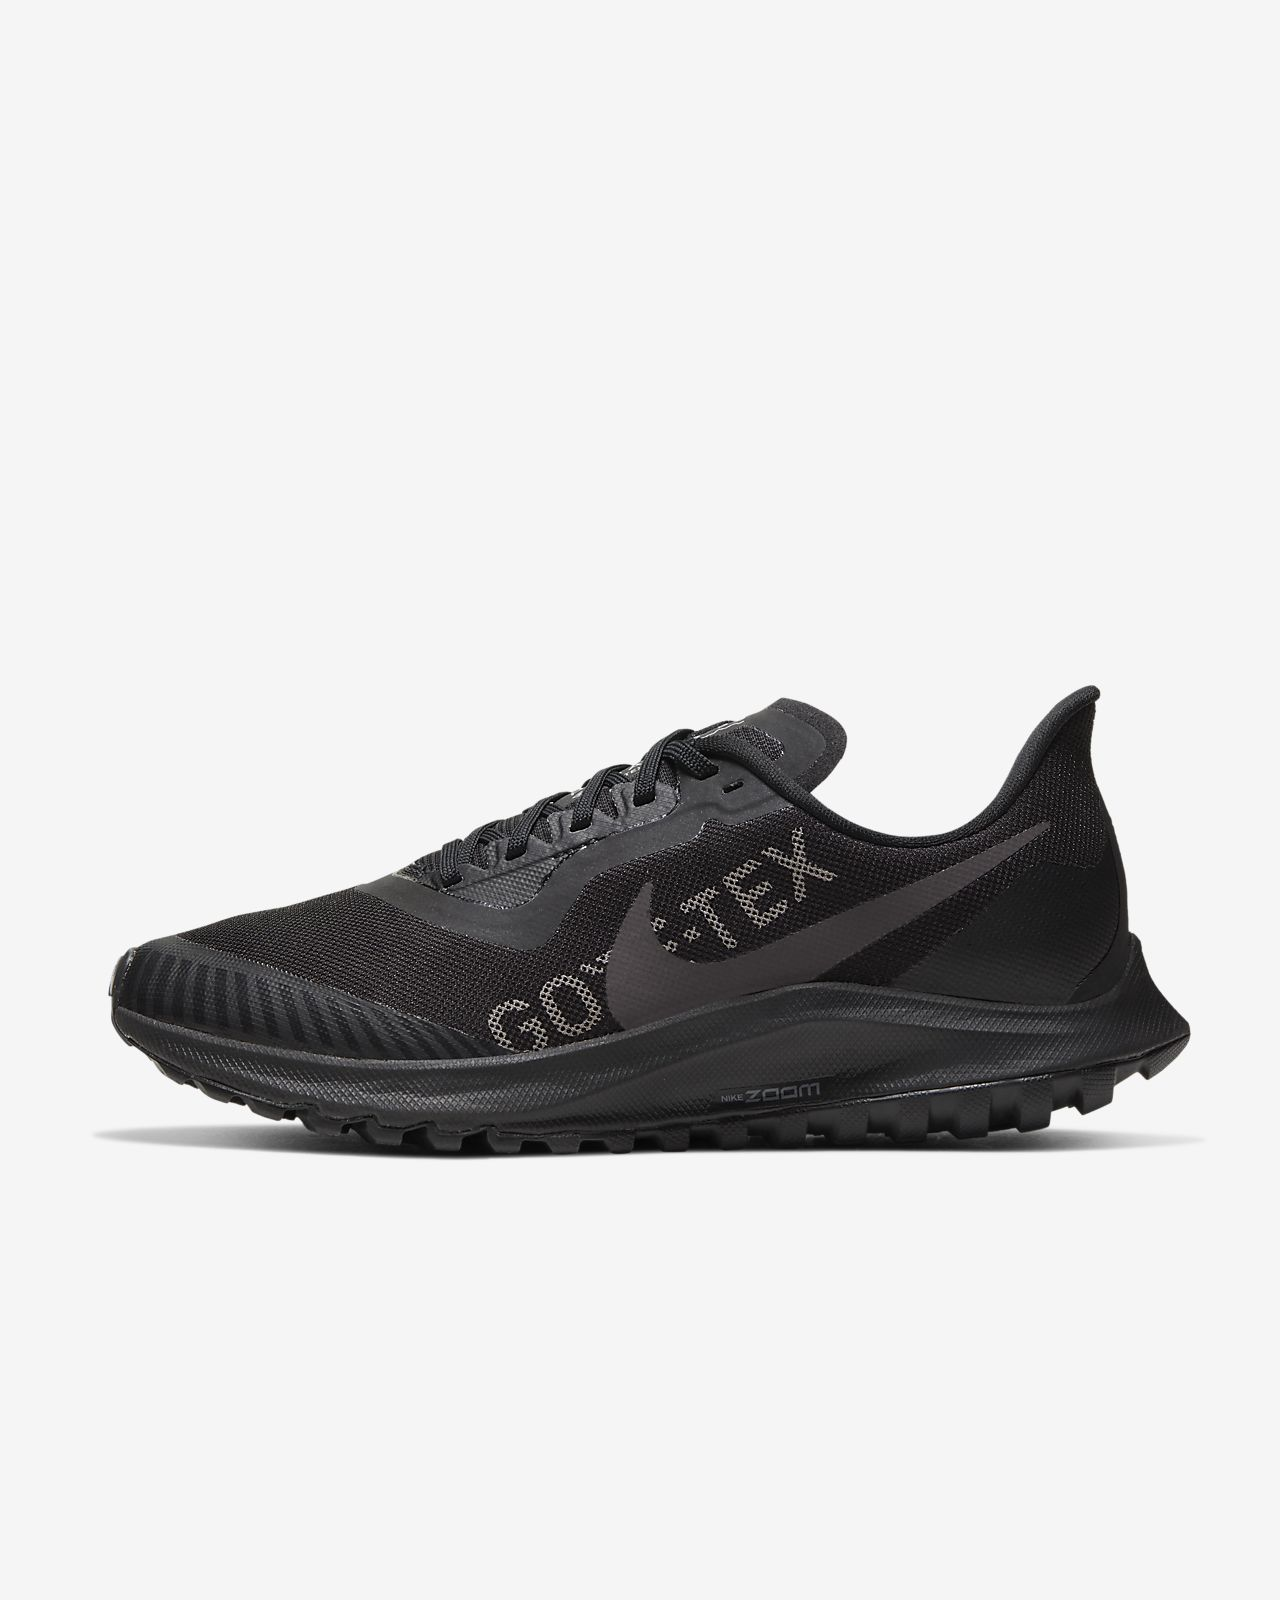 Sapatilhas de running para trilhos Nike Zoom Pegasus 36 Trail GORE-TEX para mulher